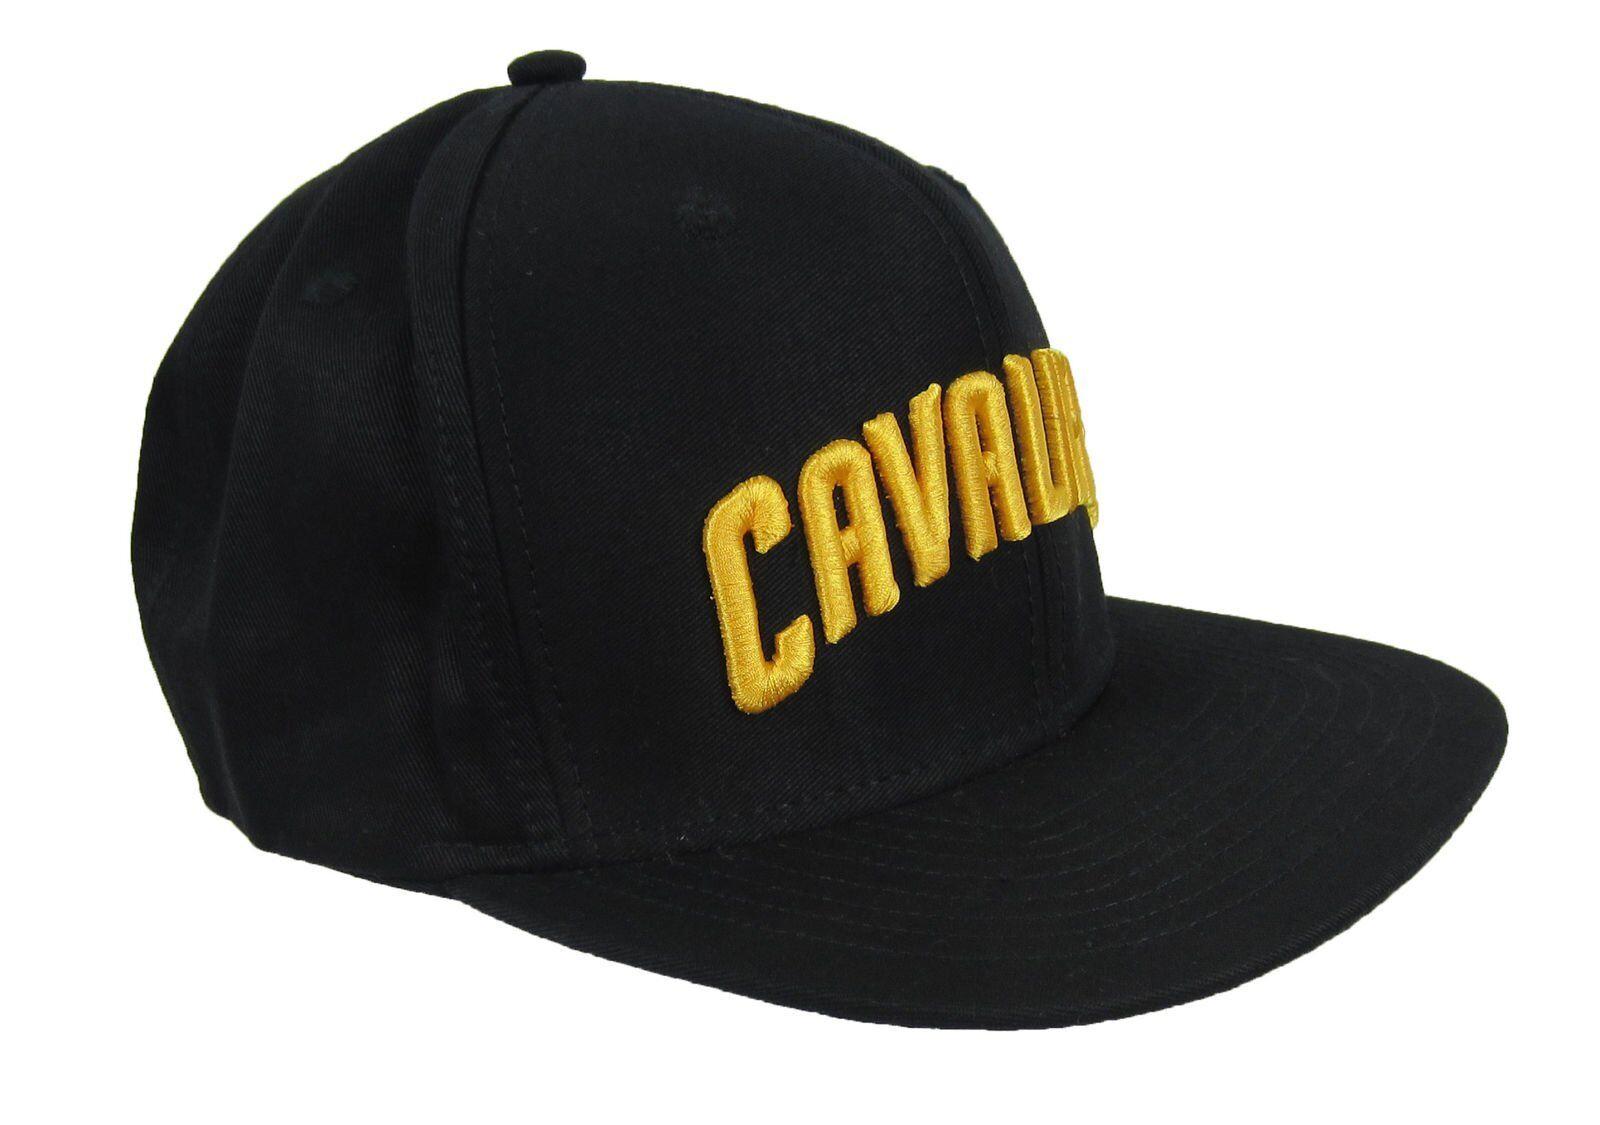 ... Adidas Snapback NBA Cleveland Cavaliers Adjustable Snapback Adidas Hat  Cat NWT 42dd29 ... 12dab85d9d